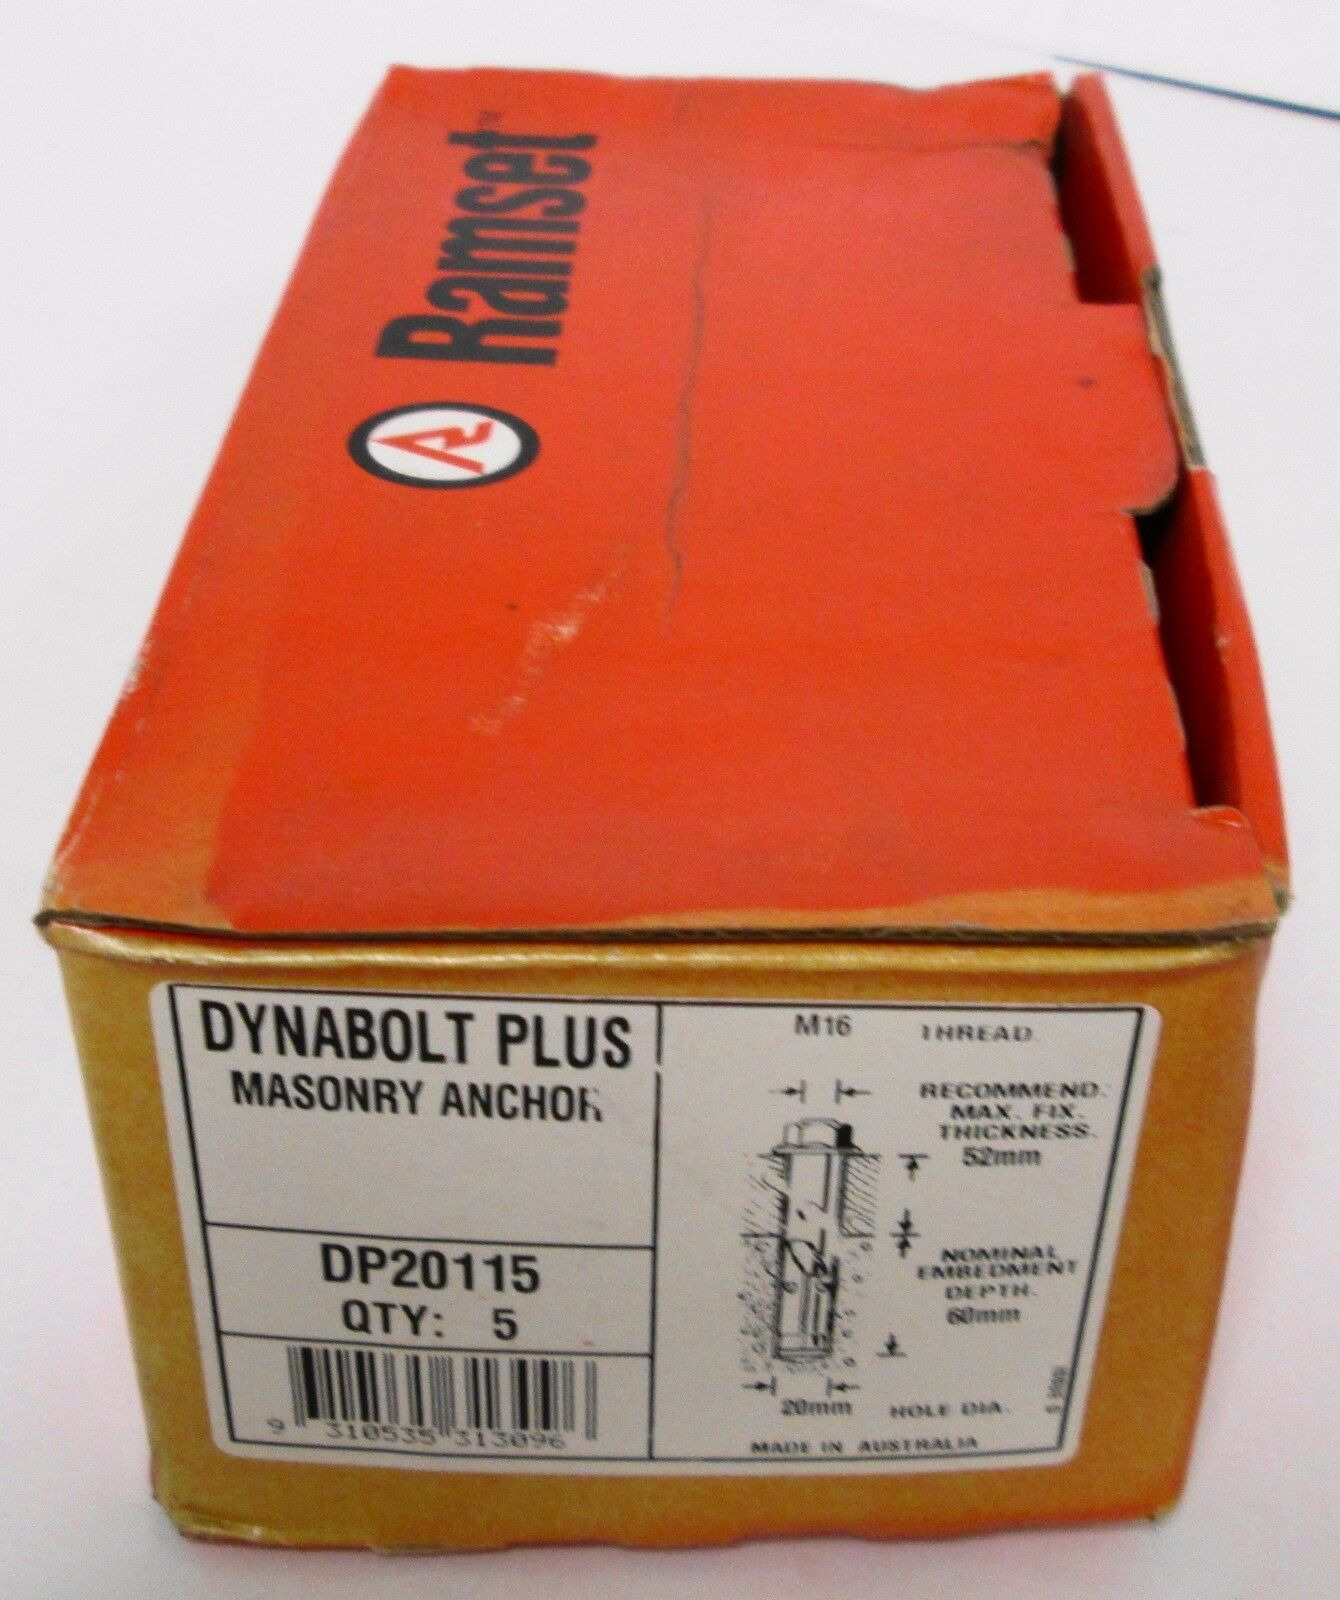 (5) RAMSET DP20115 Dynabolt Plus Masonry Anchor 20mm